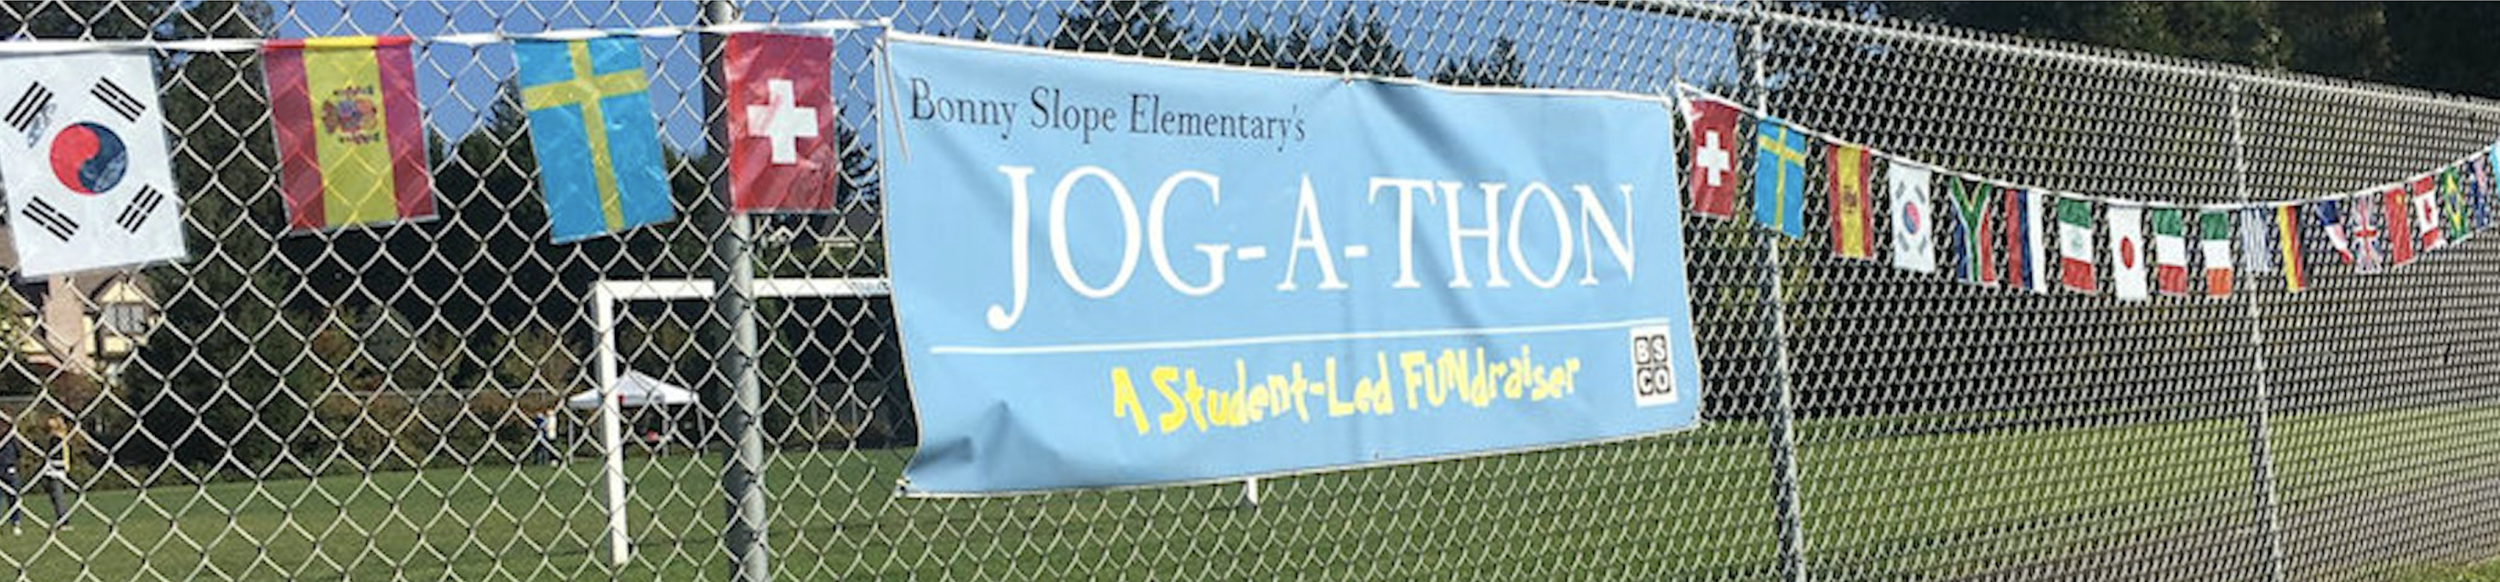 JAT banner 1.png